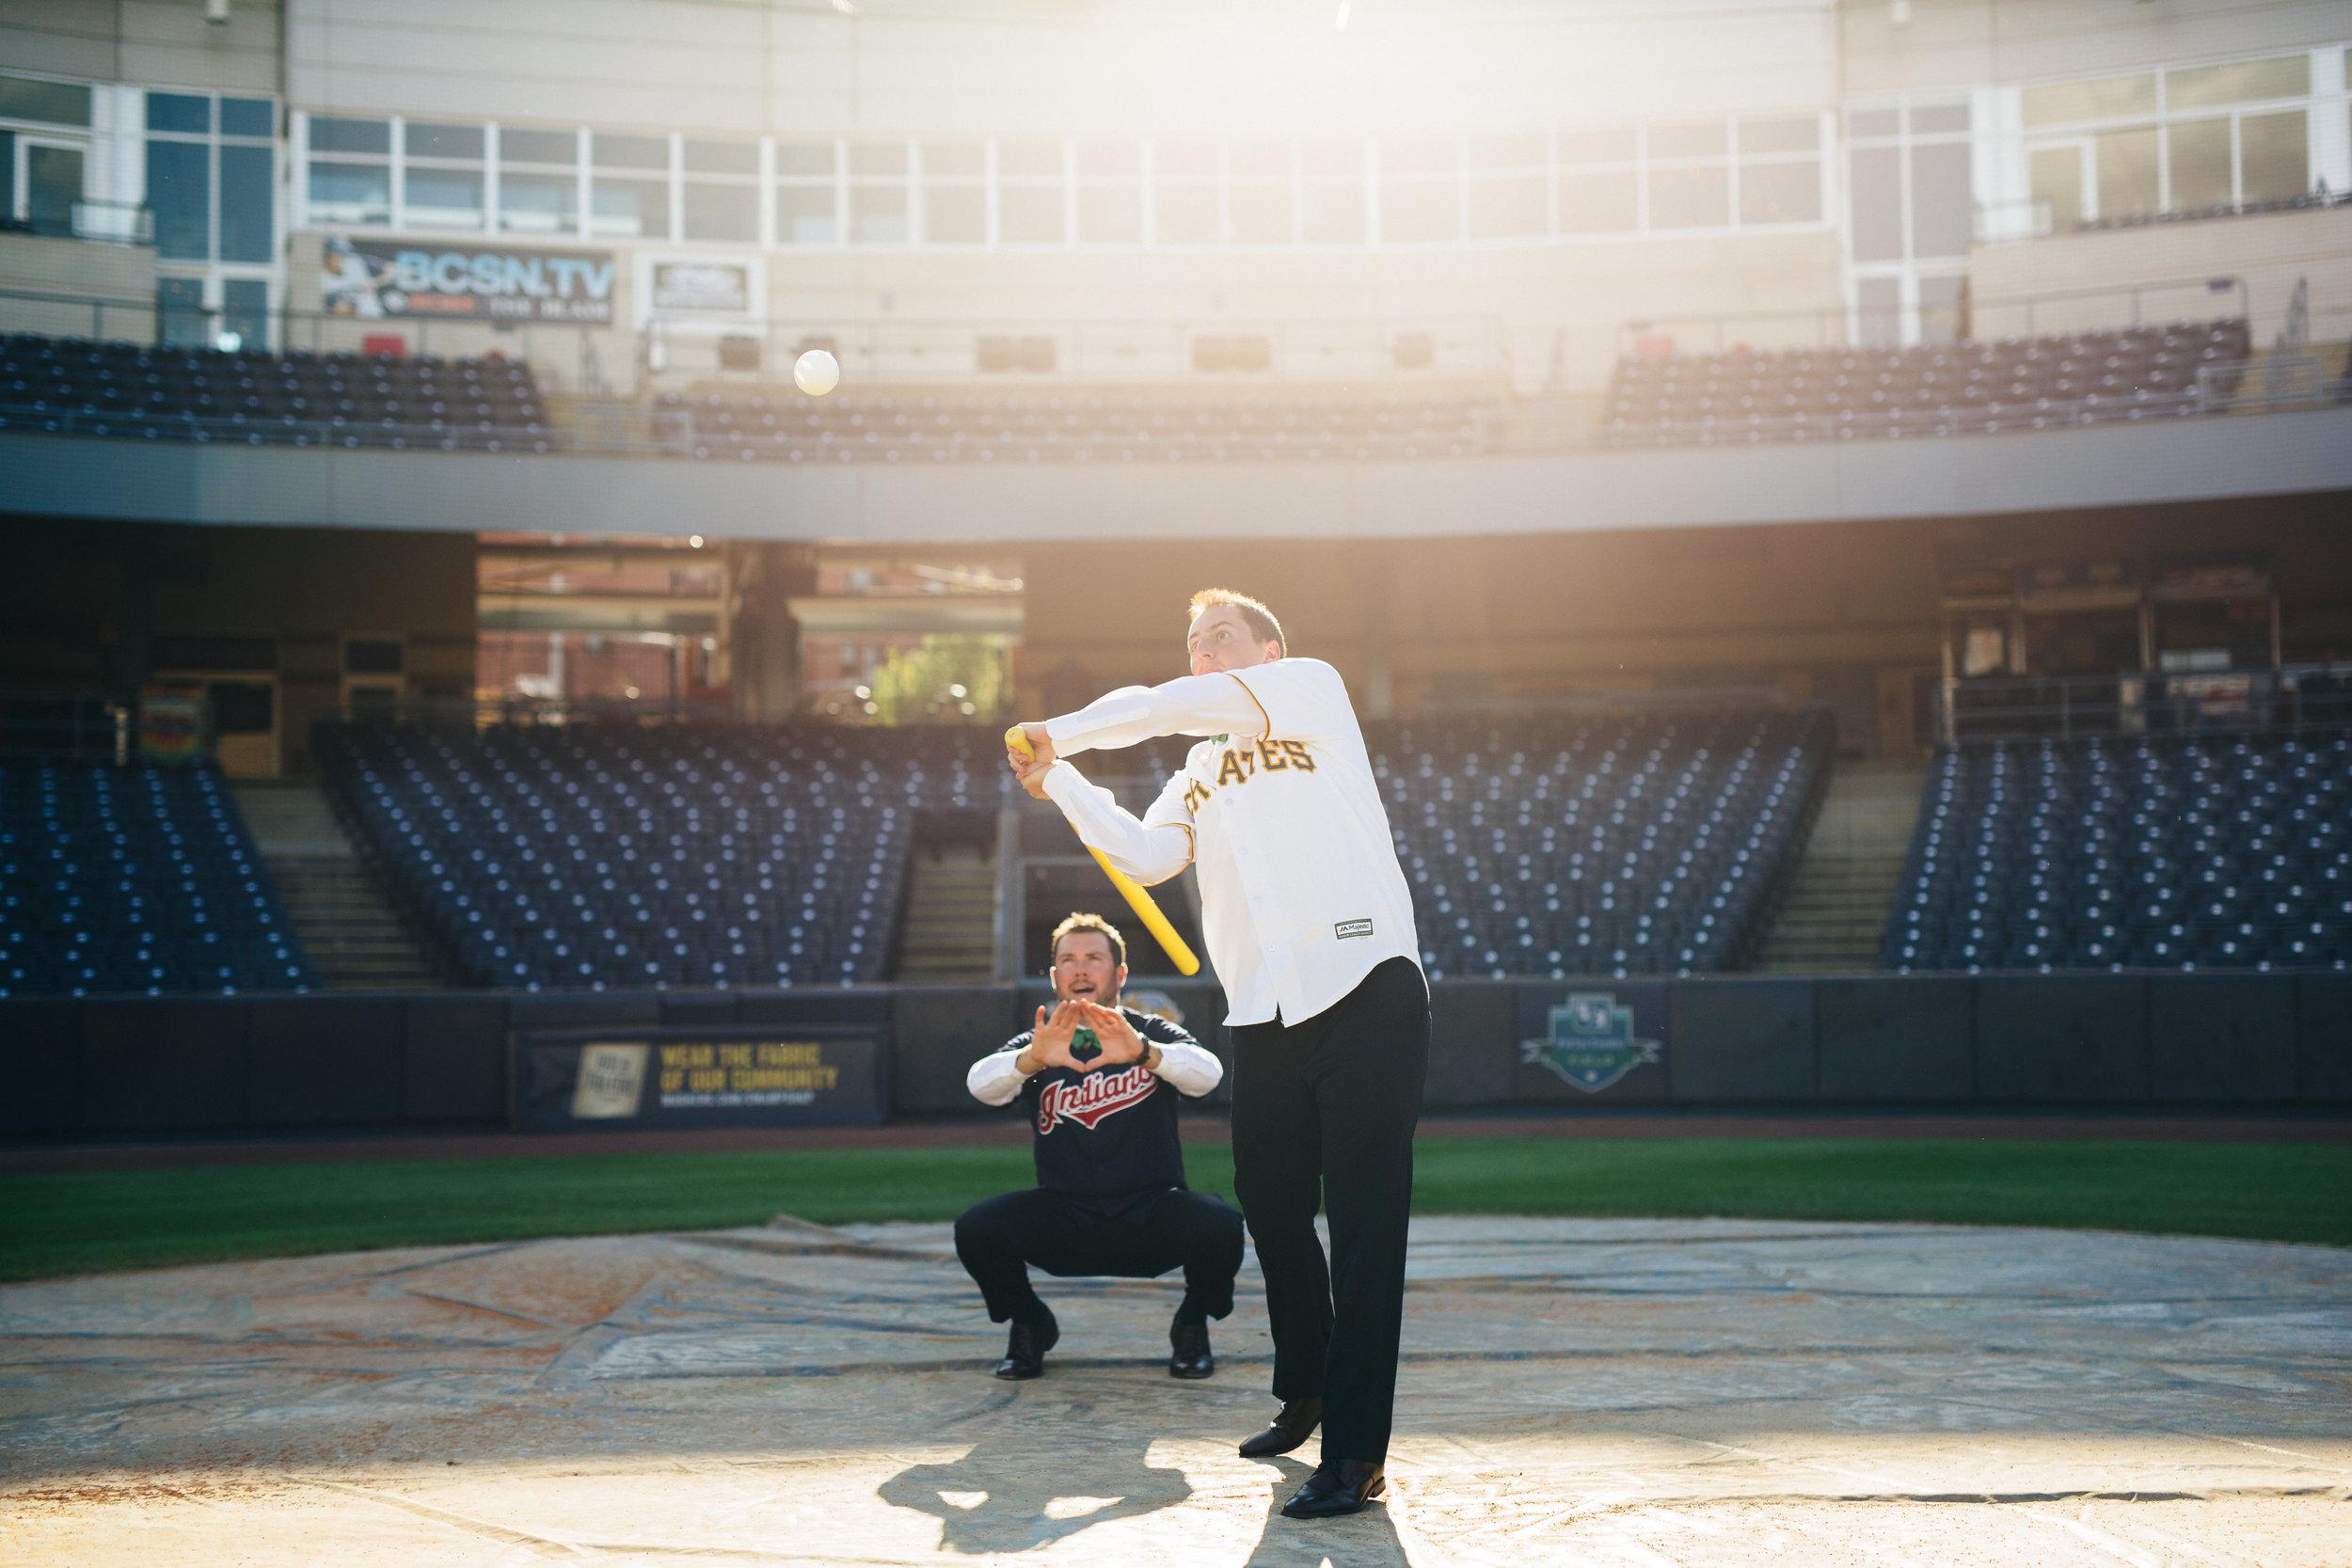 Fun baseball themed wedding photography at the Mudhen's Stadium in Toledo, Ohio.